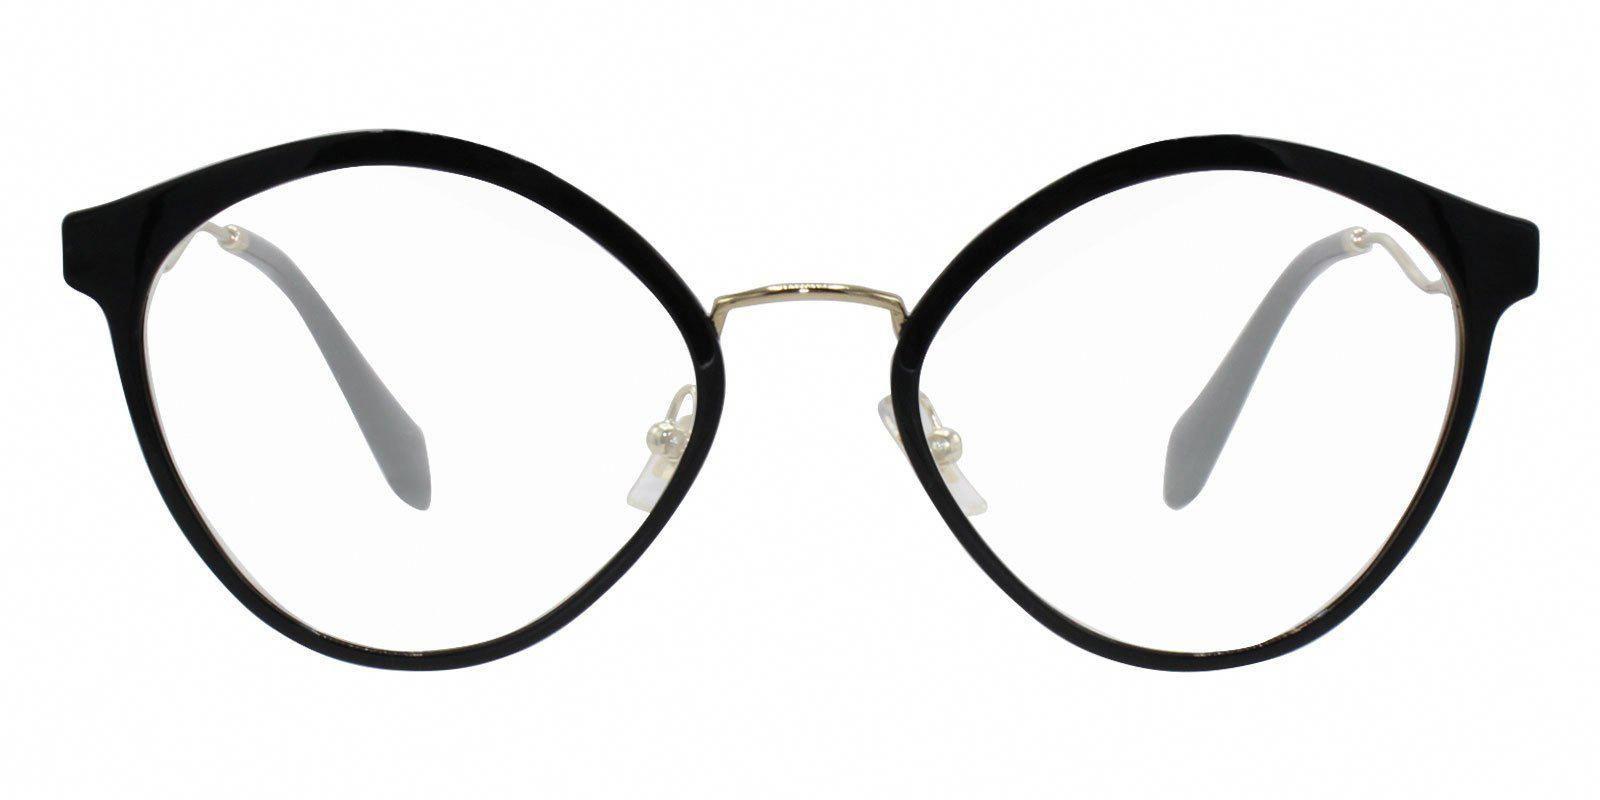 5df5fa9711f Miu Miu - MU52QV Black eyeglasses